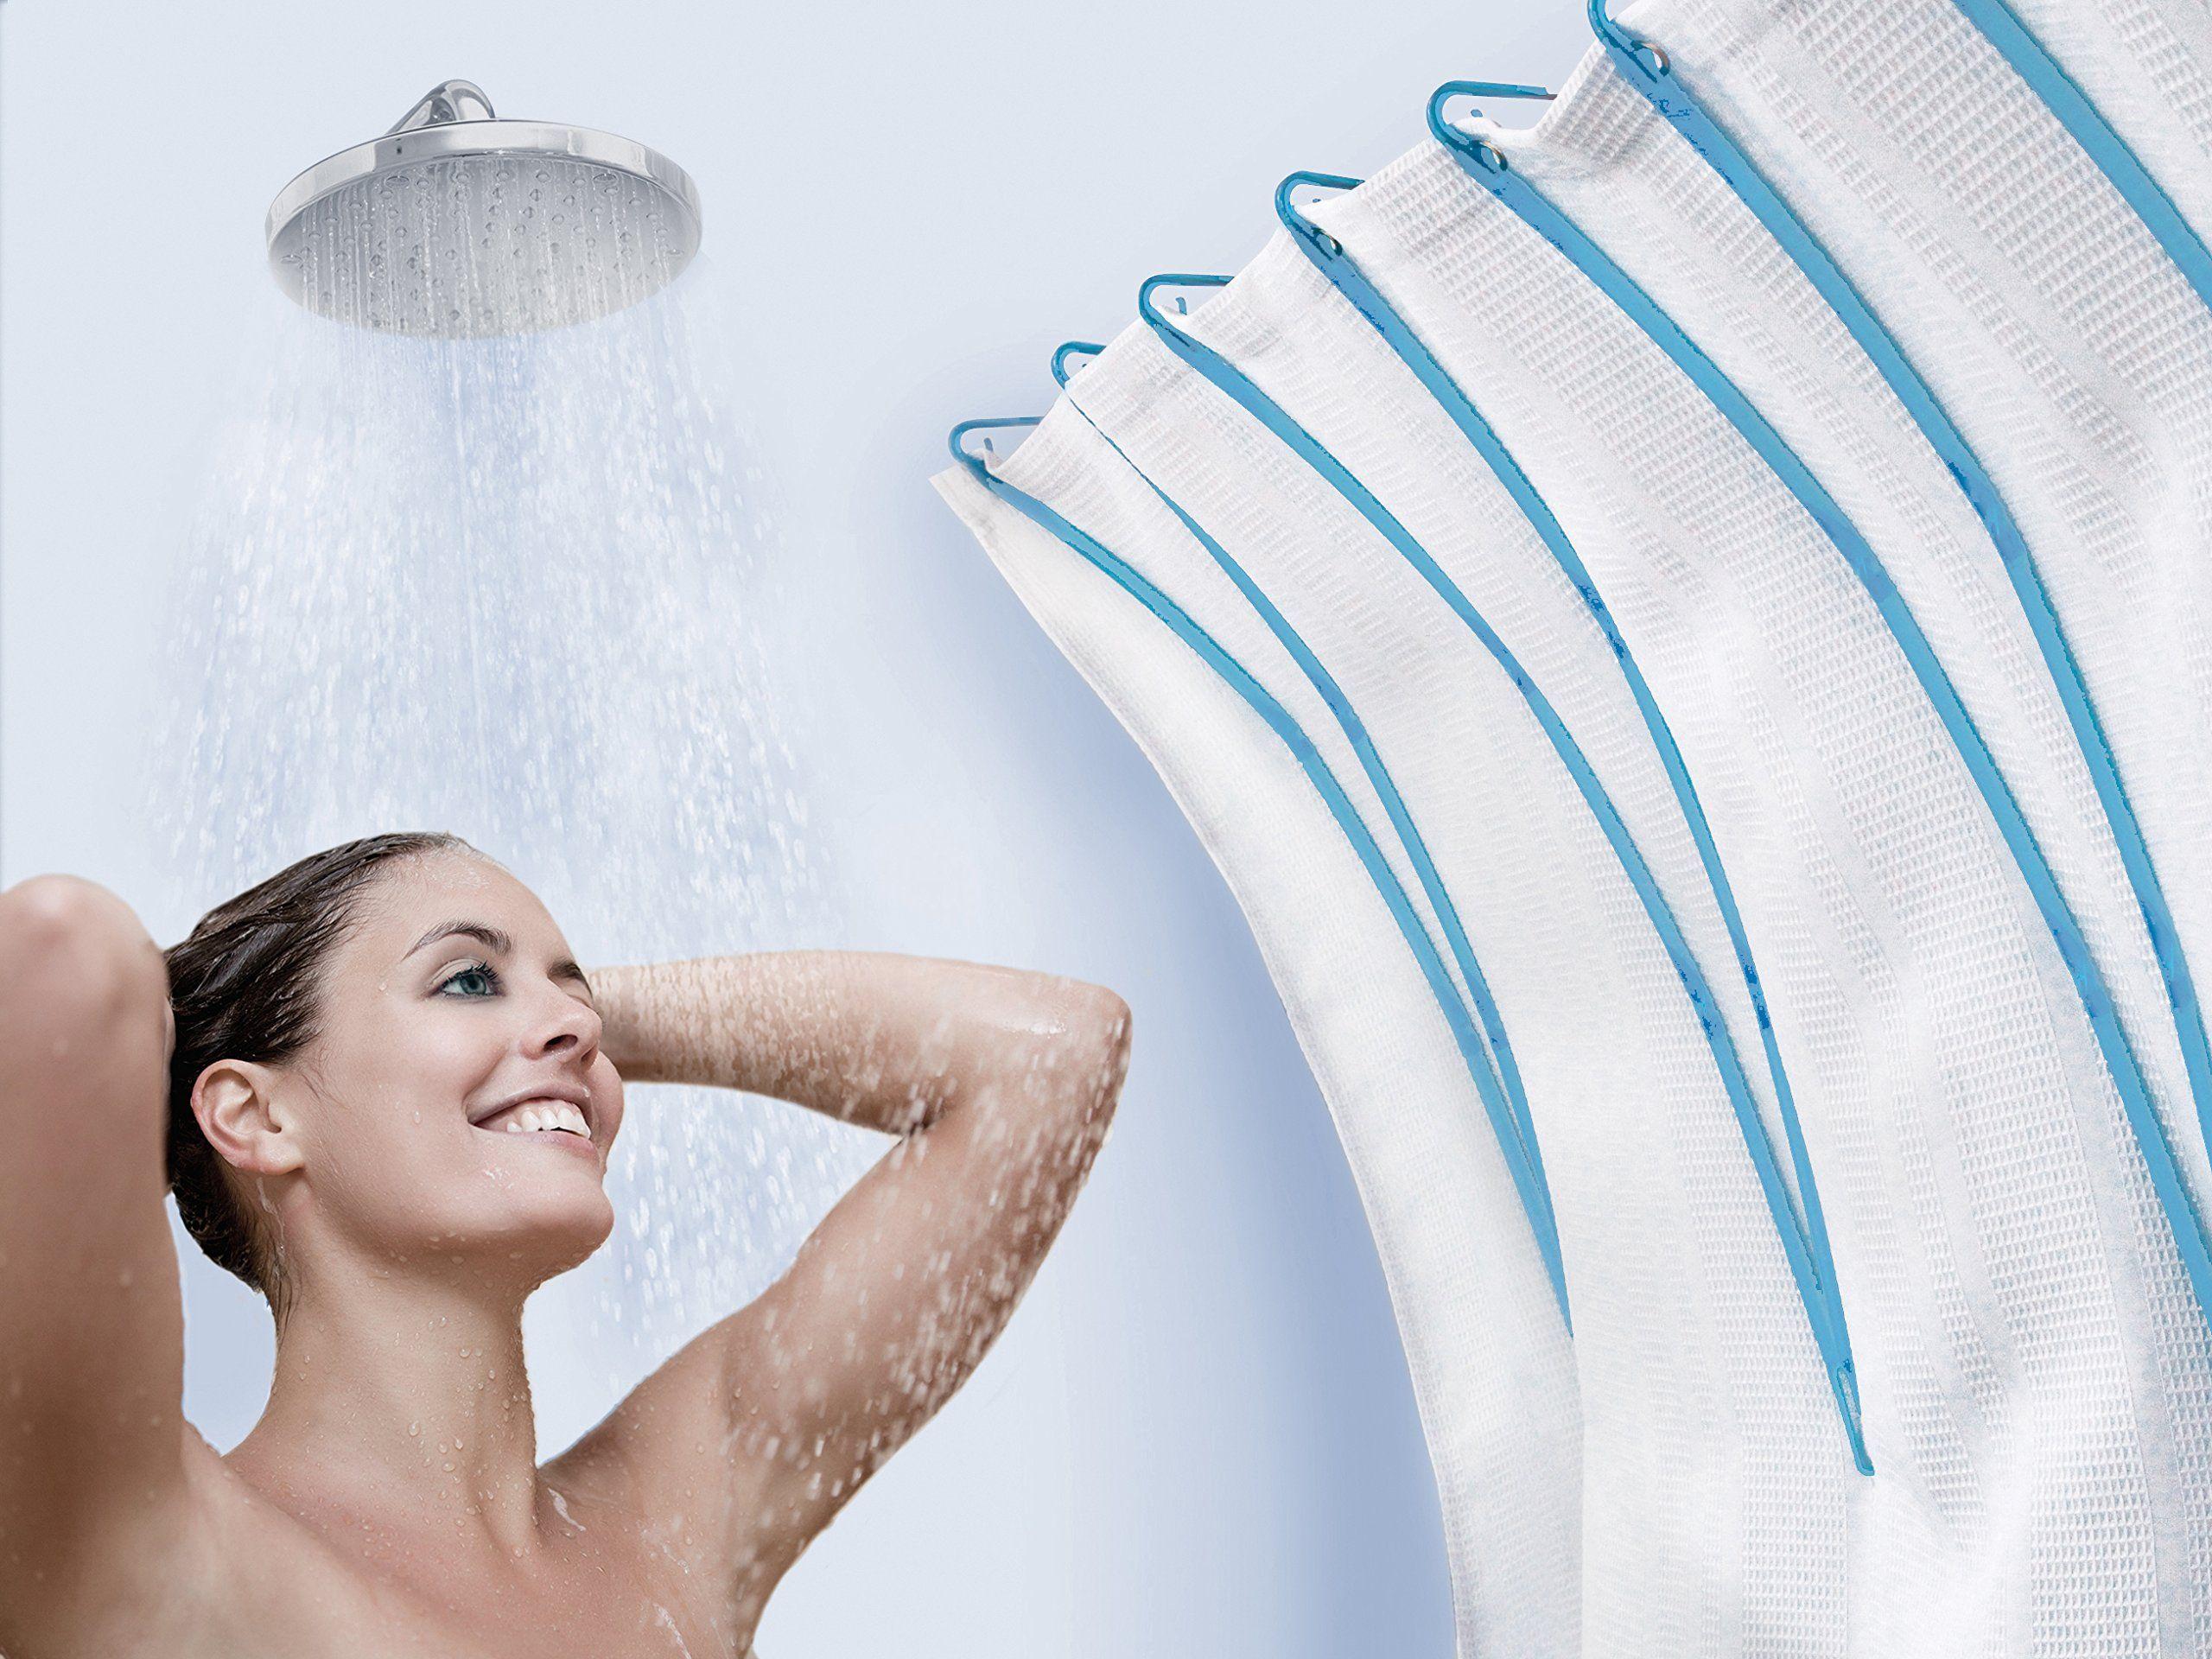 Curvit - Simple Curved Shower Rod Alternative - Stylish Set of 12 ...